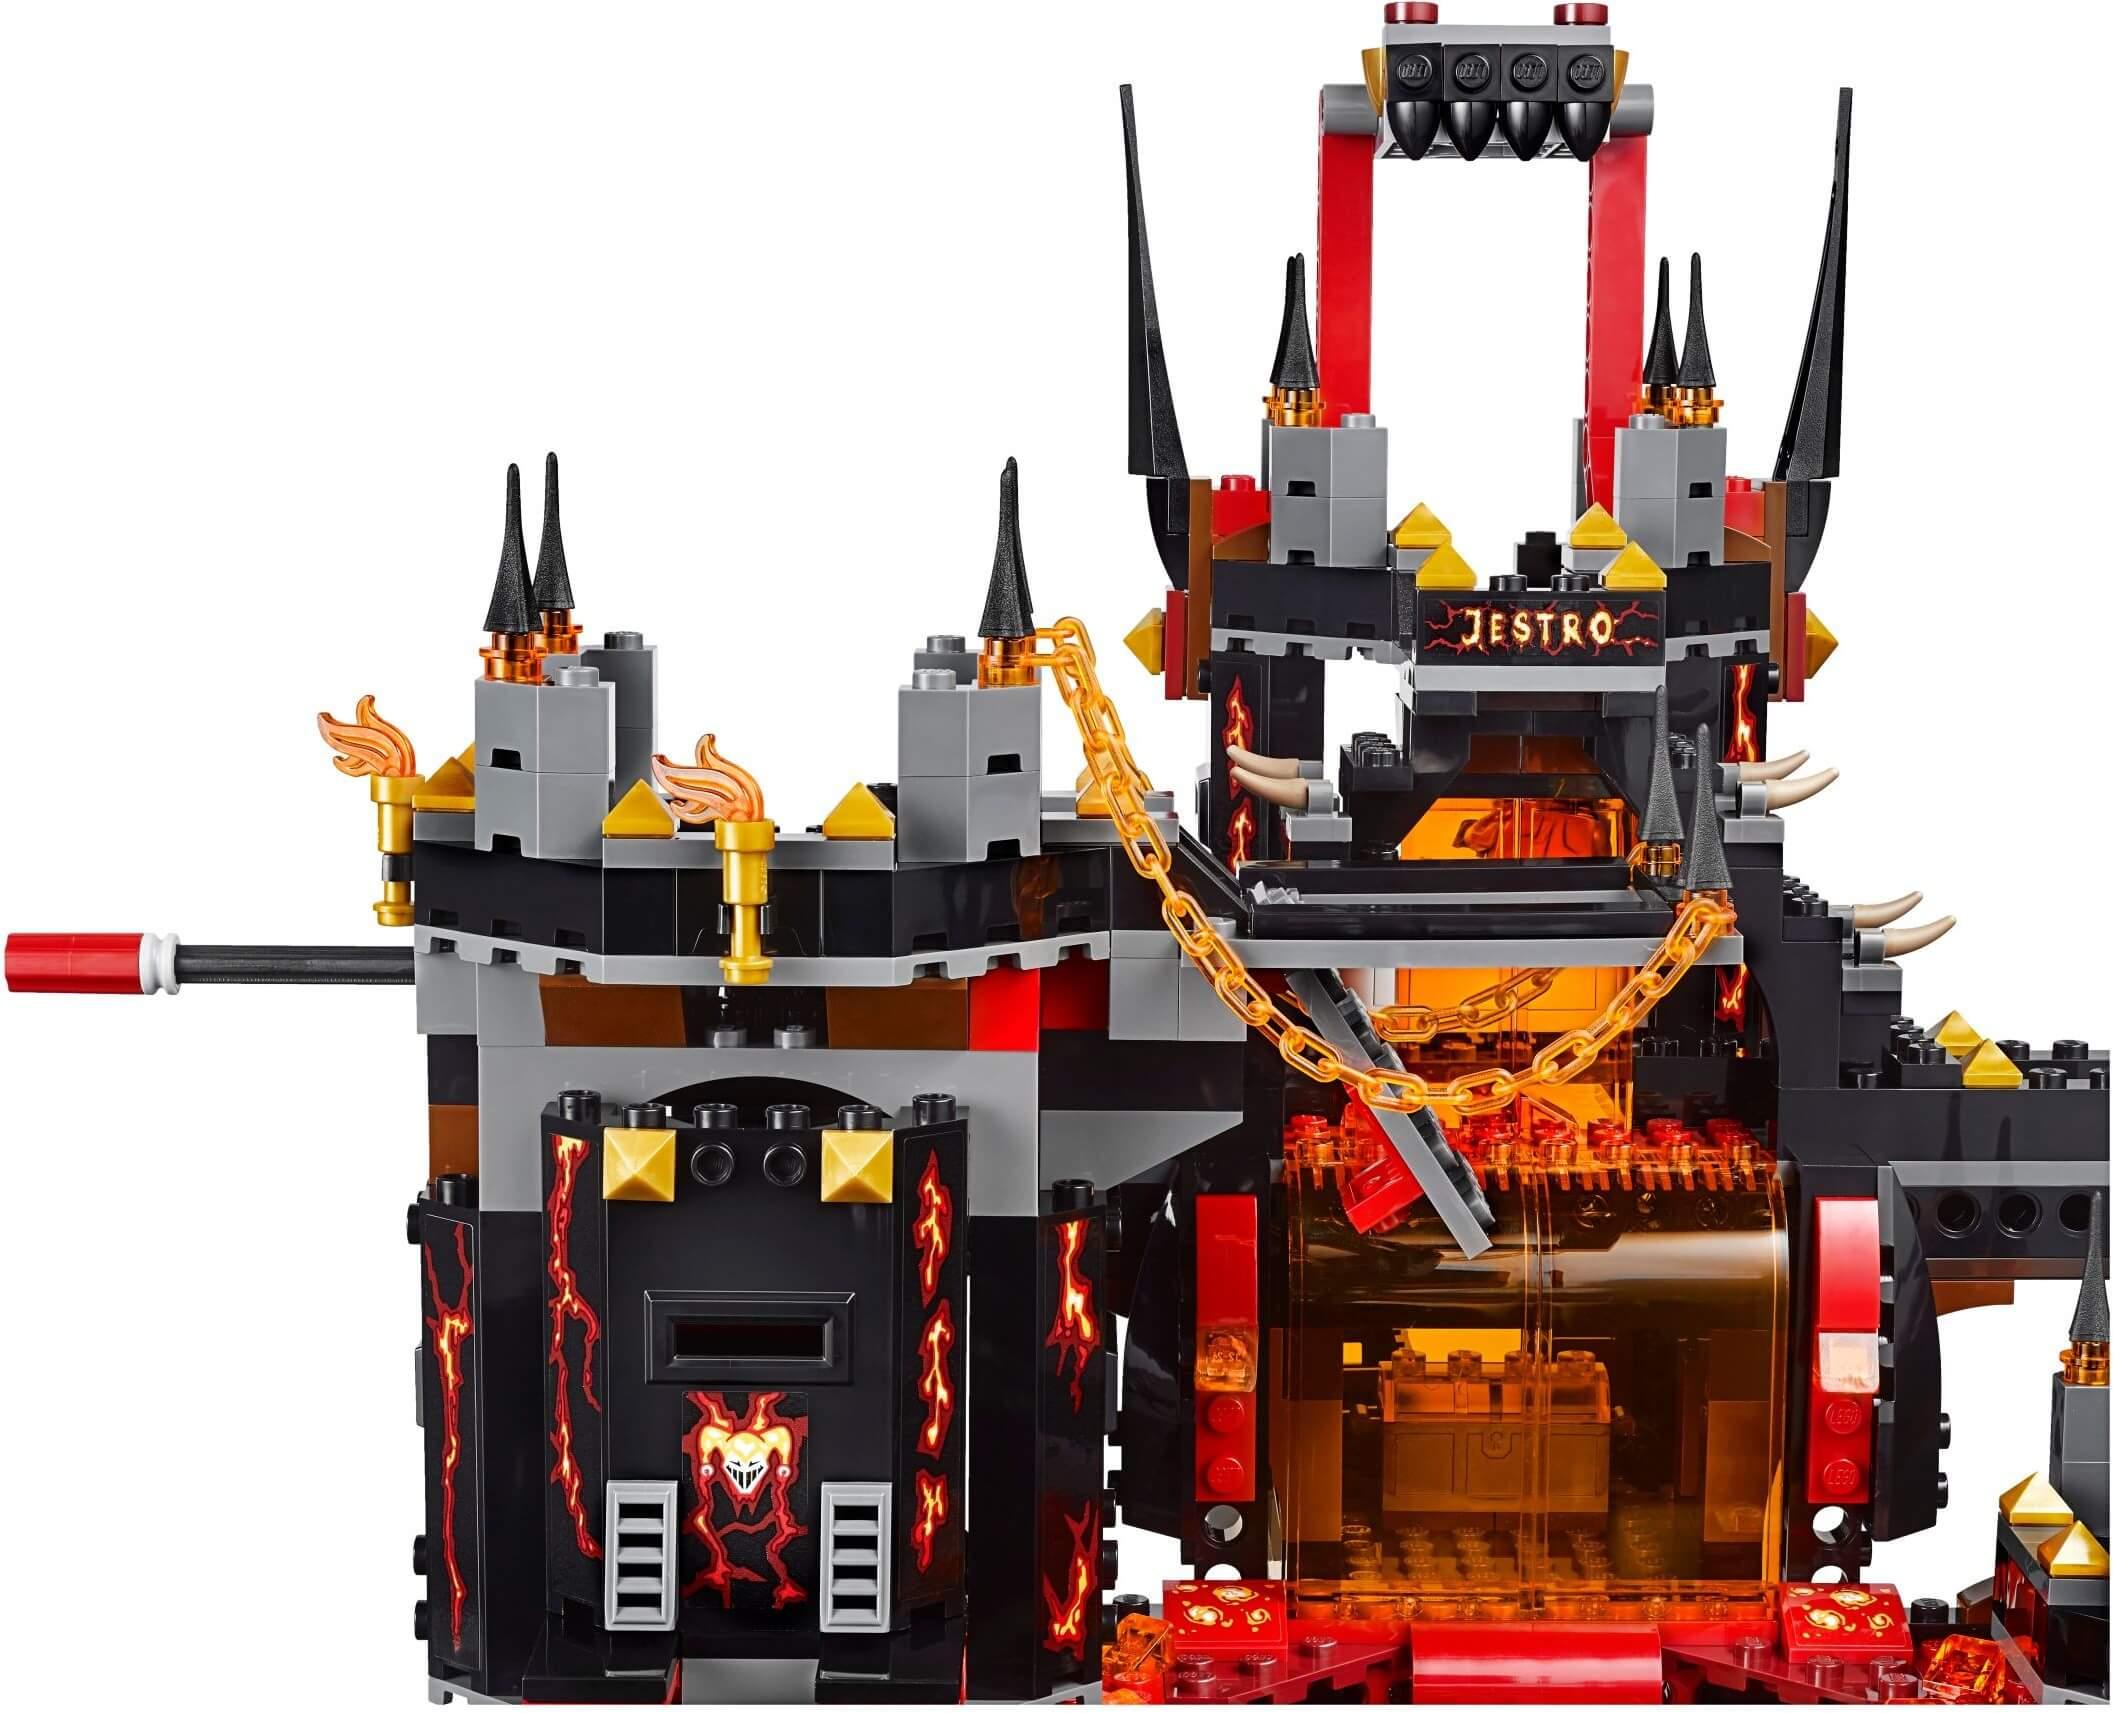 Mua đồ chơi LEGO 70323 - LEGO Nexo Knights 70323 - Pháo Đài Nham Thạch của Jestro (LEGO Nexo Knights Jestro's Volcano Lair 70323)